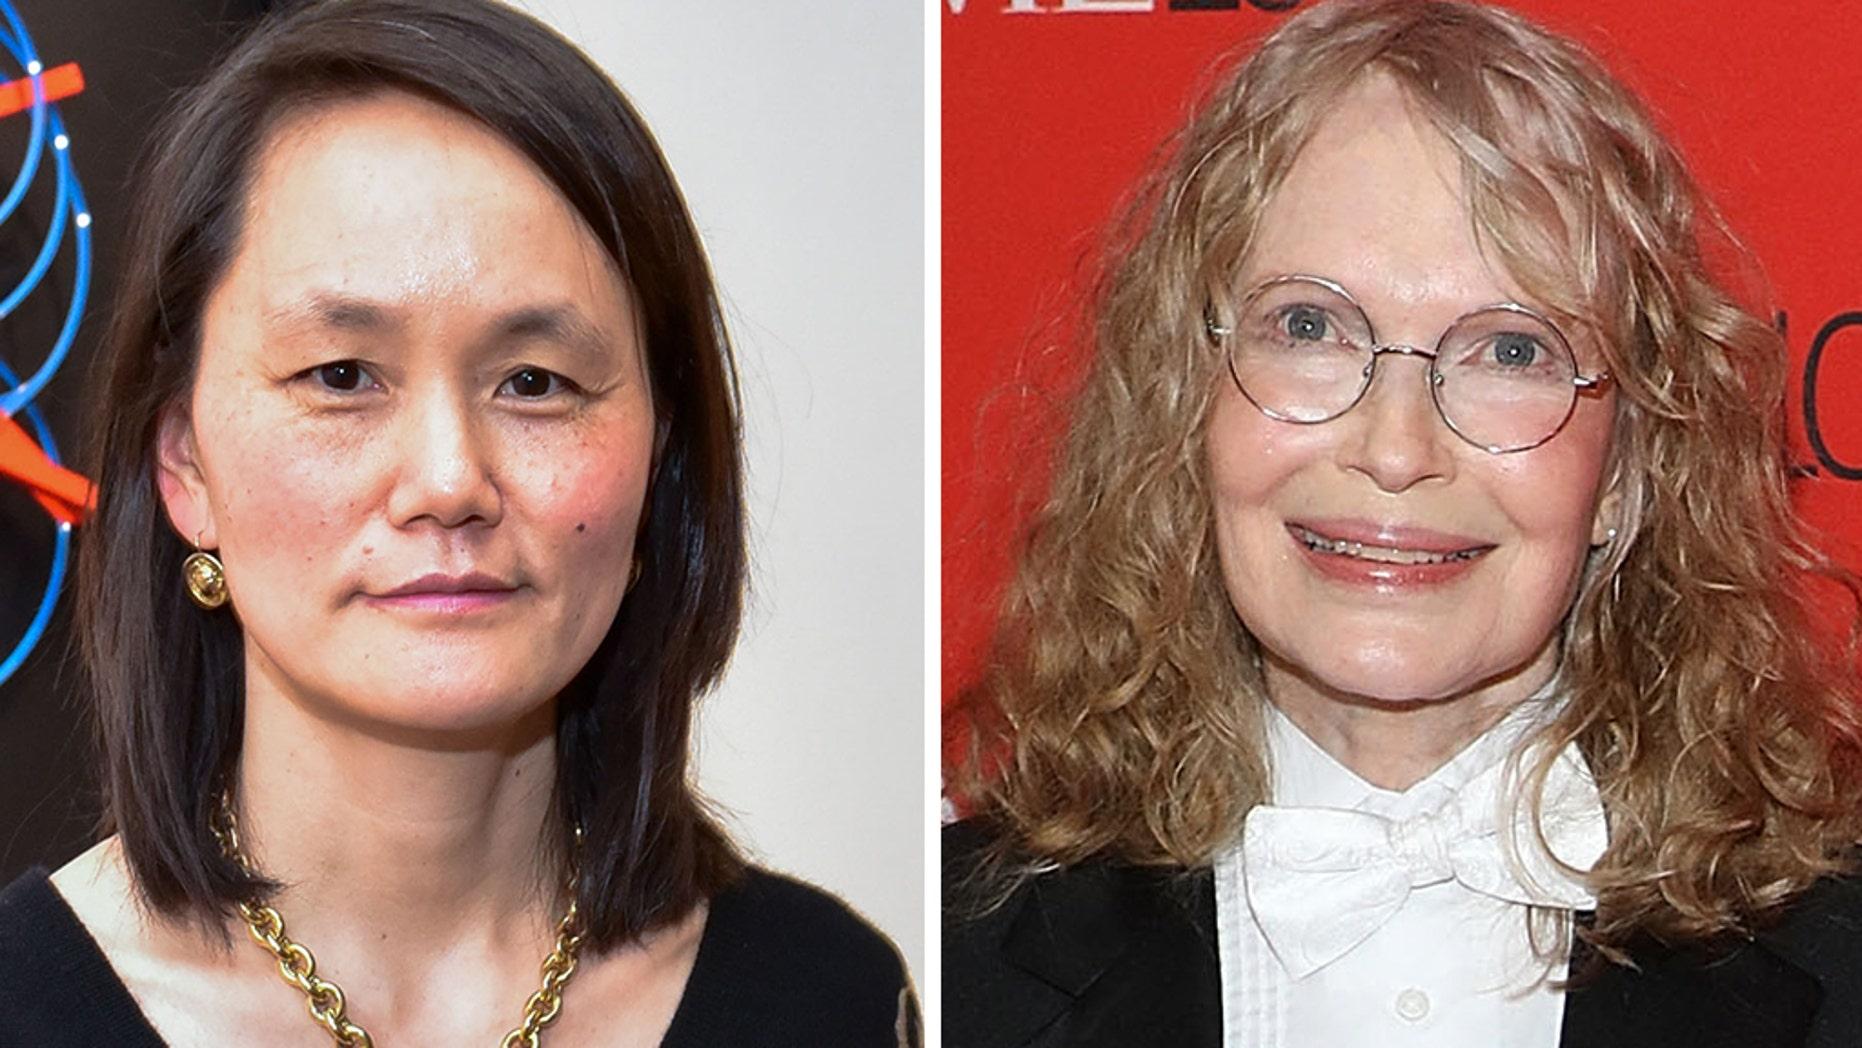 Soon-Yi Previn, left, broke her silence by slamming Mia Farrow, her adoptive mother.